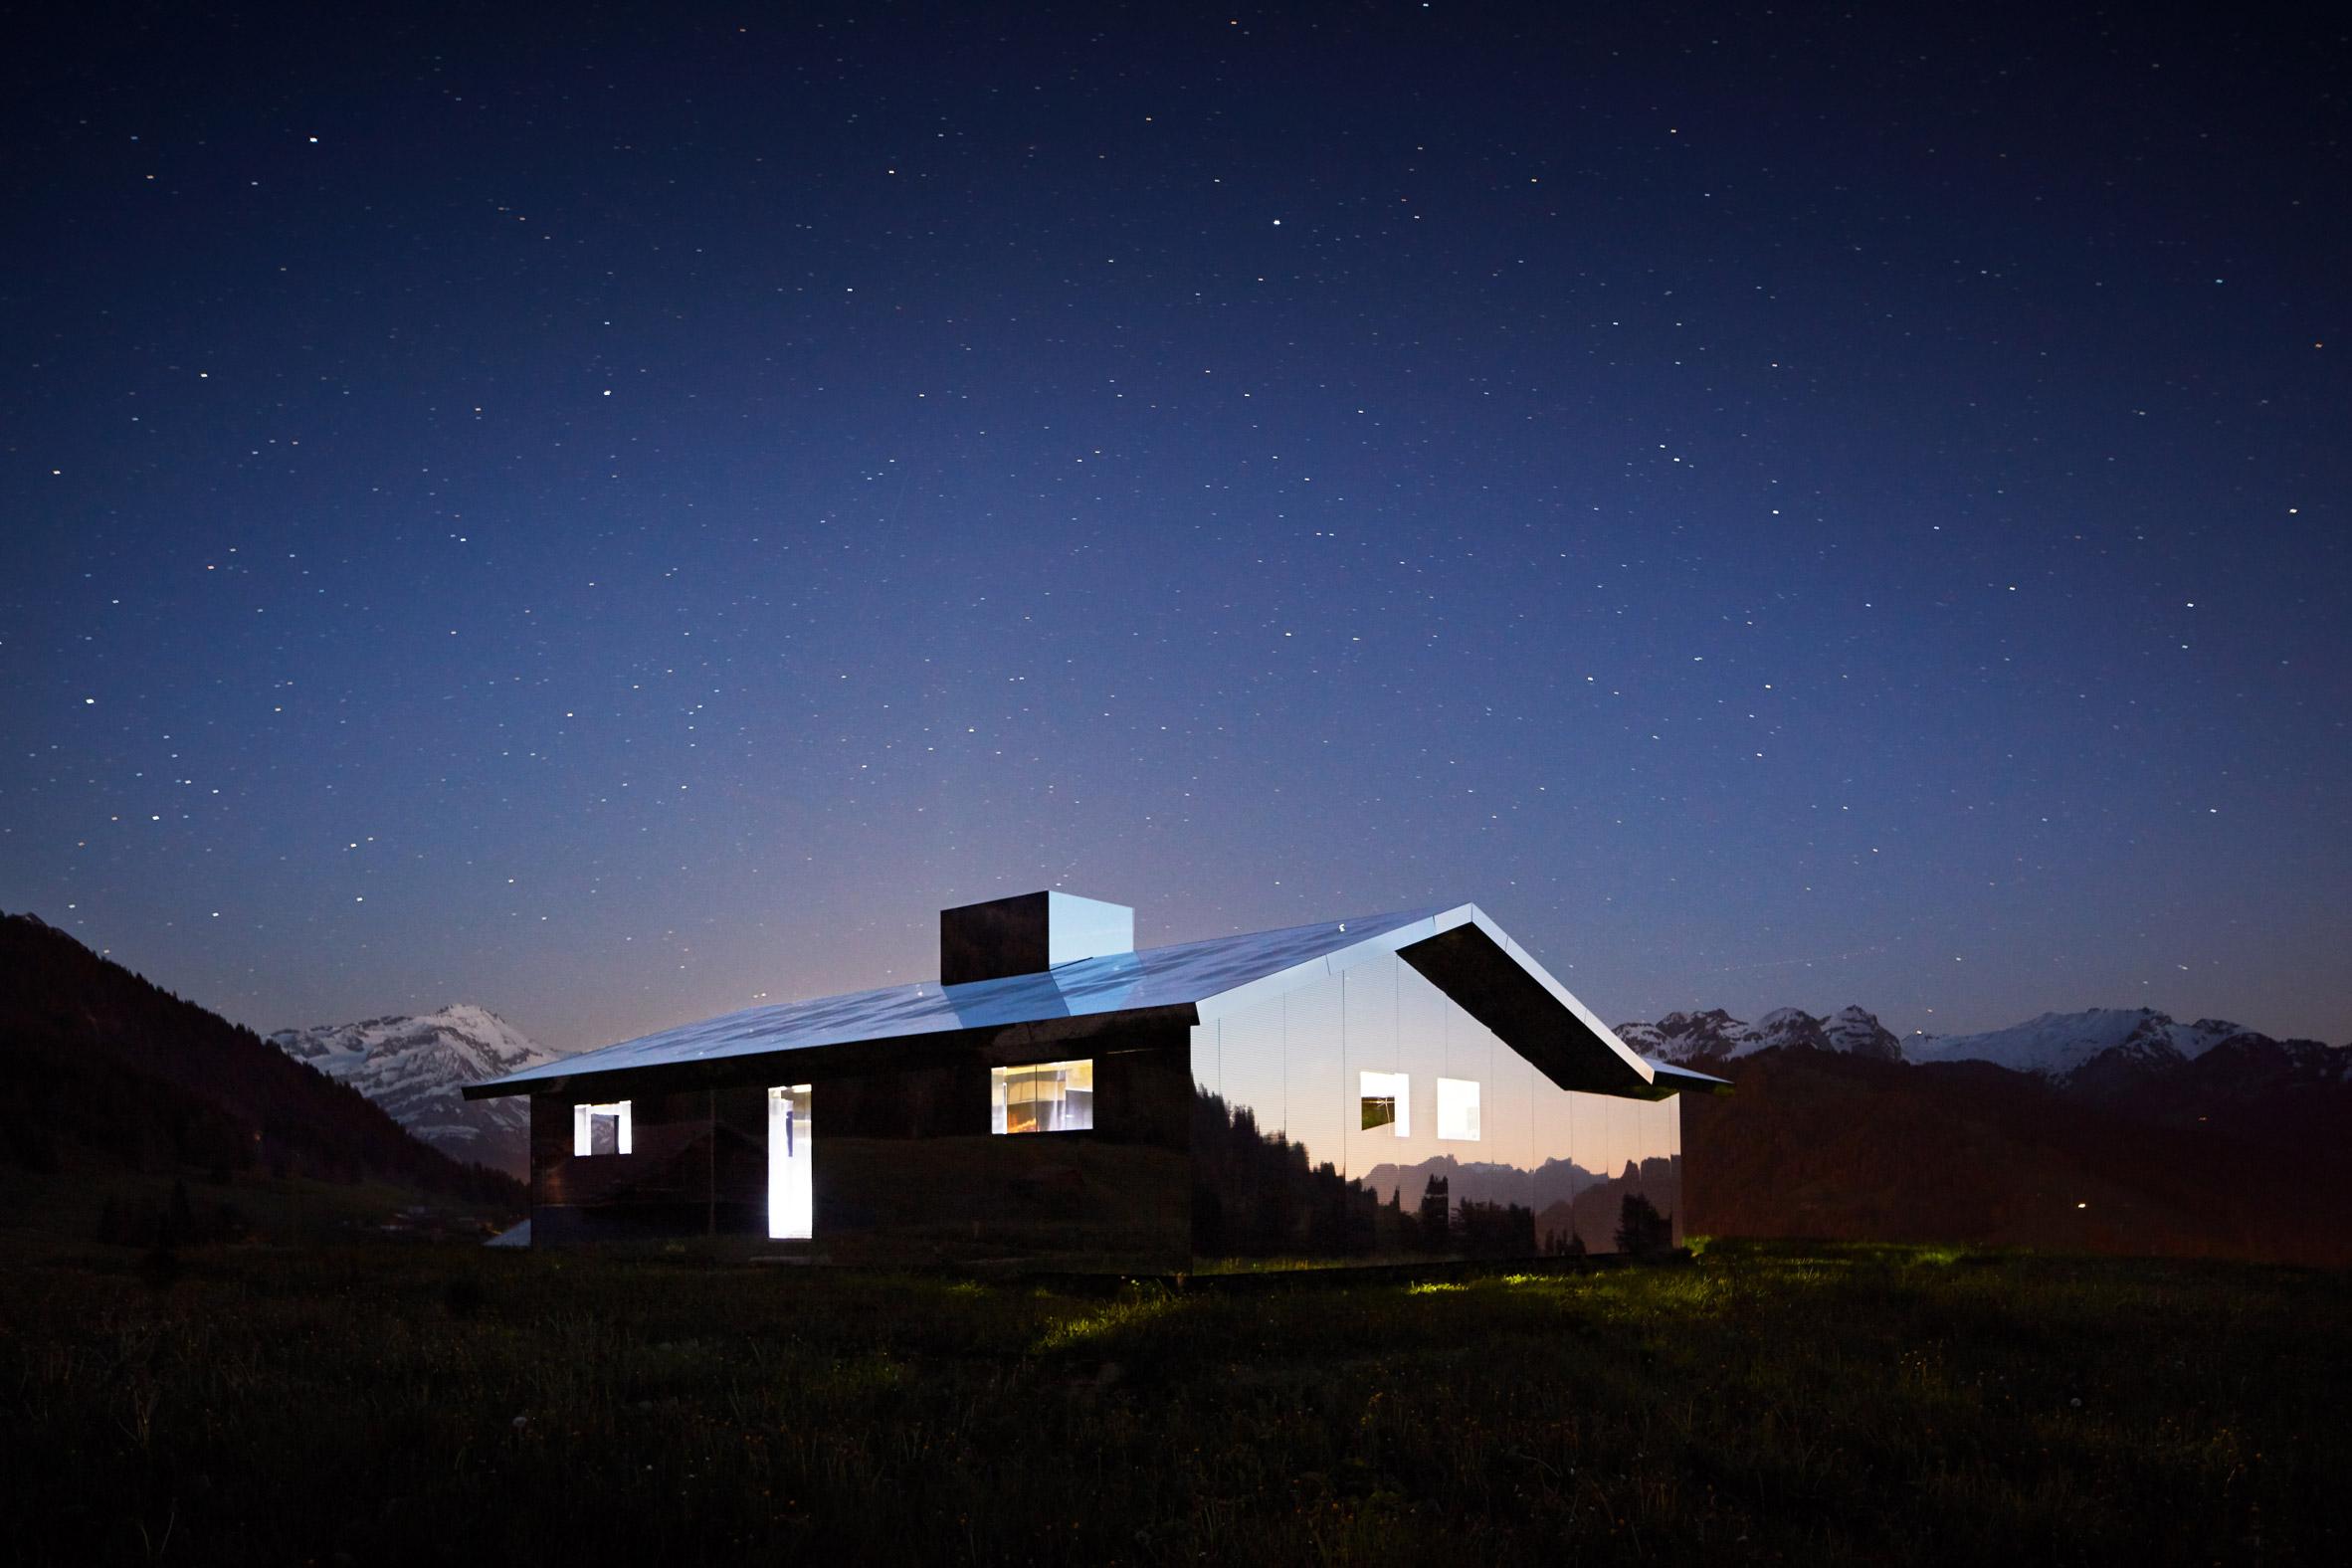 Mirage Gstaad mirrored building art installation by Doug Aitken in Switzerland at night